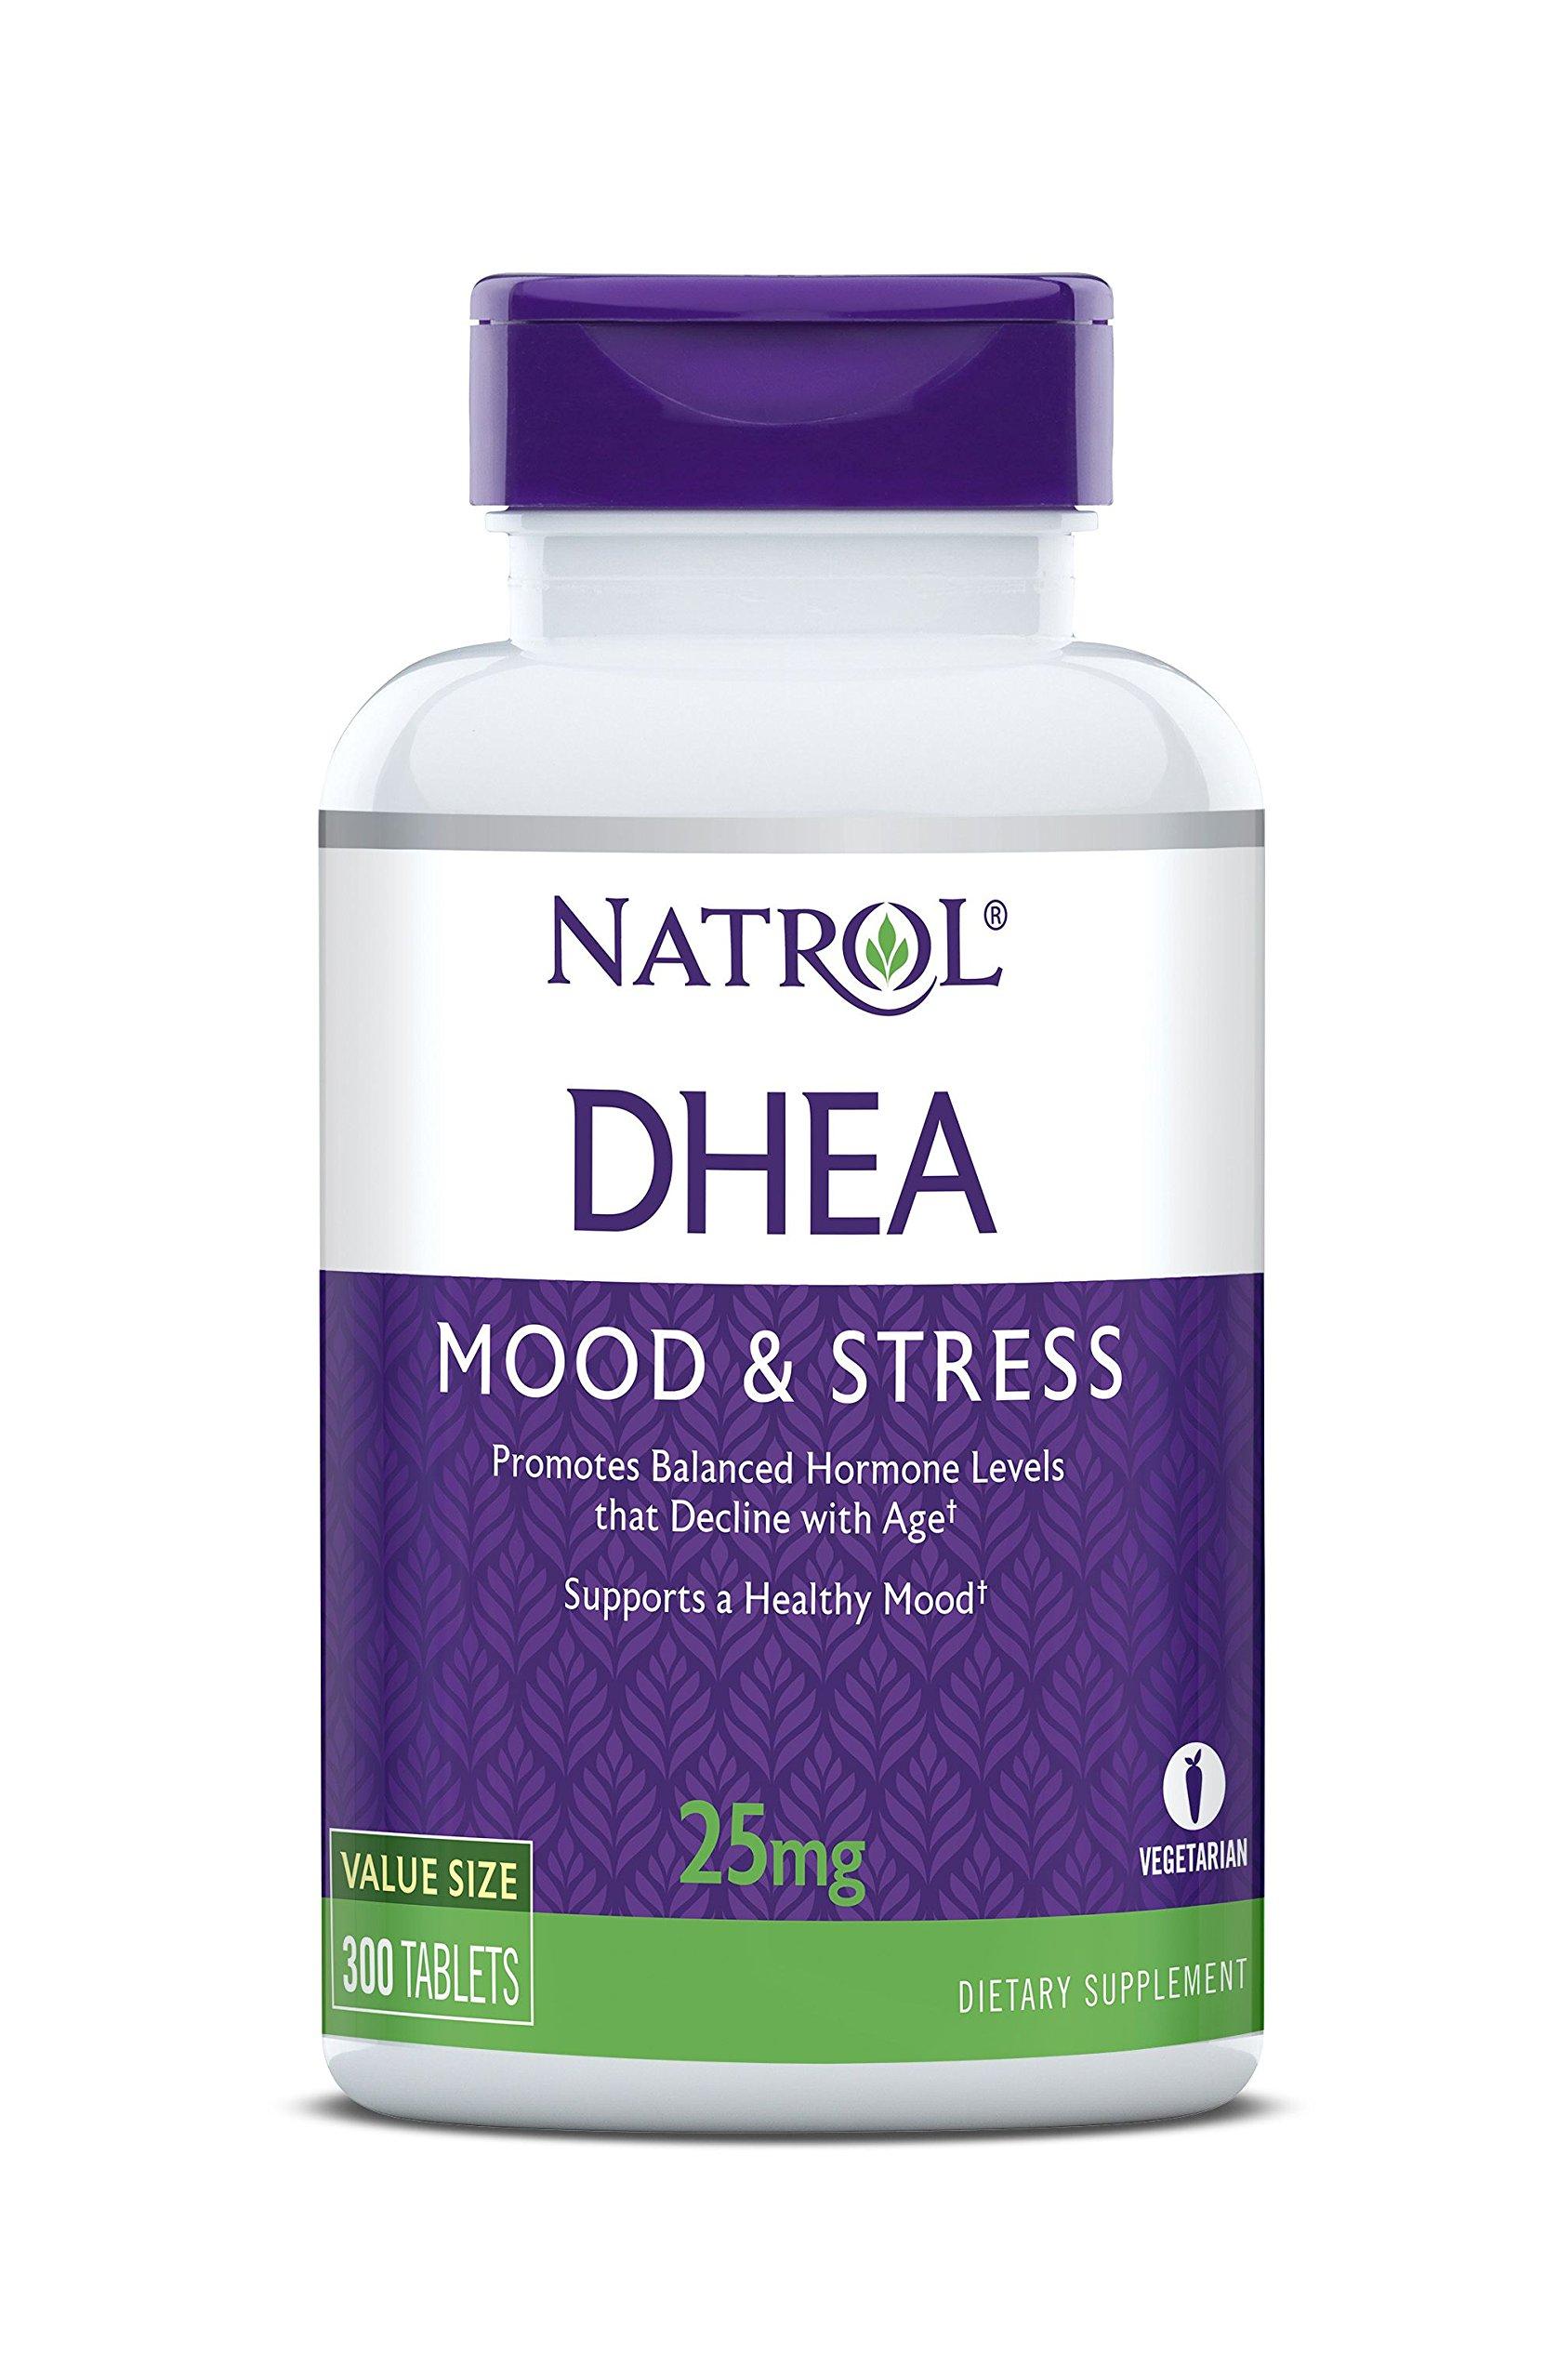 Natrol DHEA 25mg Tablets, 300 Count